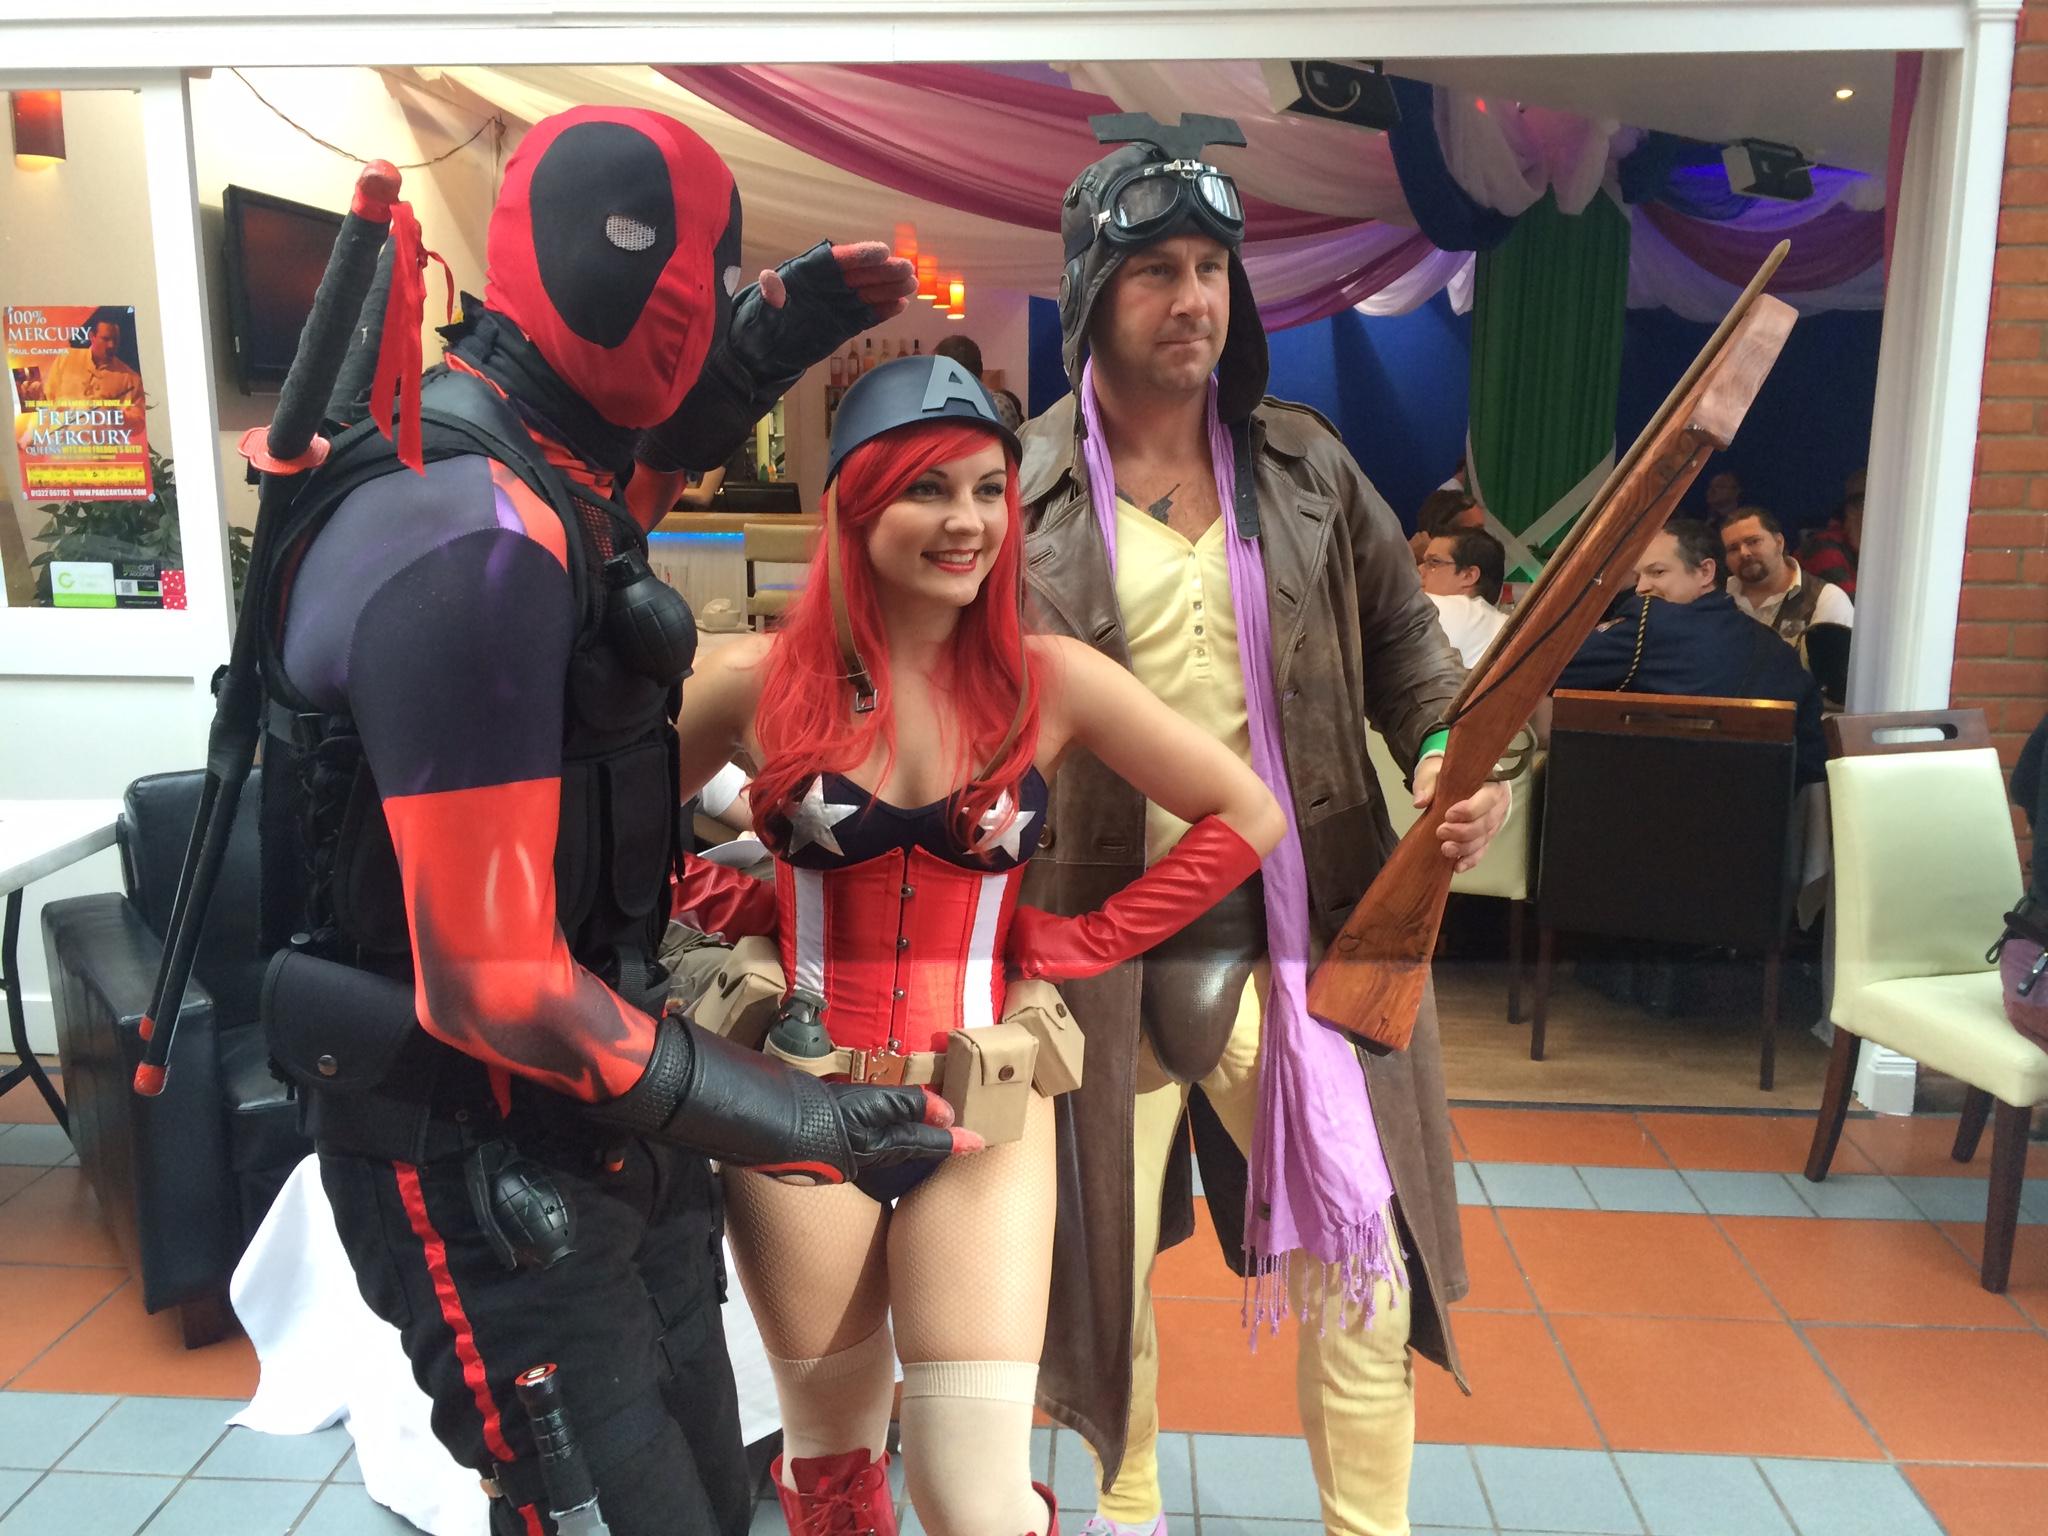 Cosplayers enjoying their day at DemonCon X. Photo: Tony Esmond